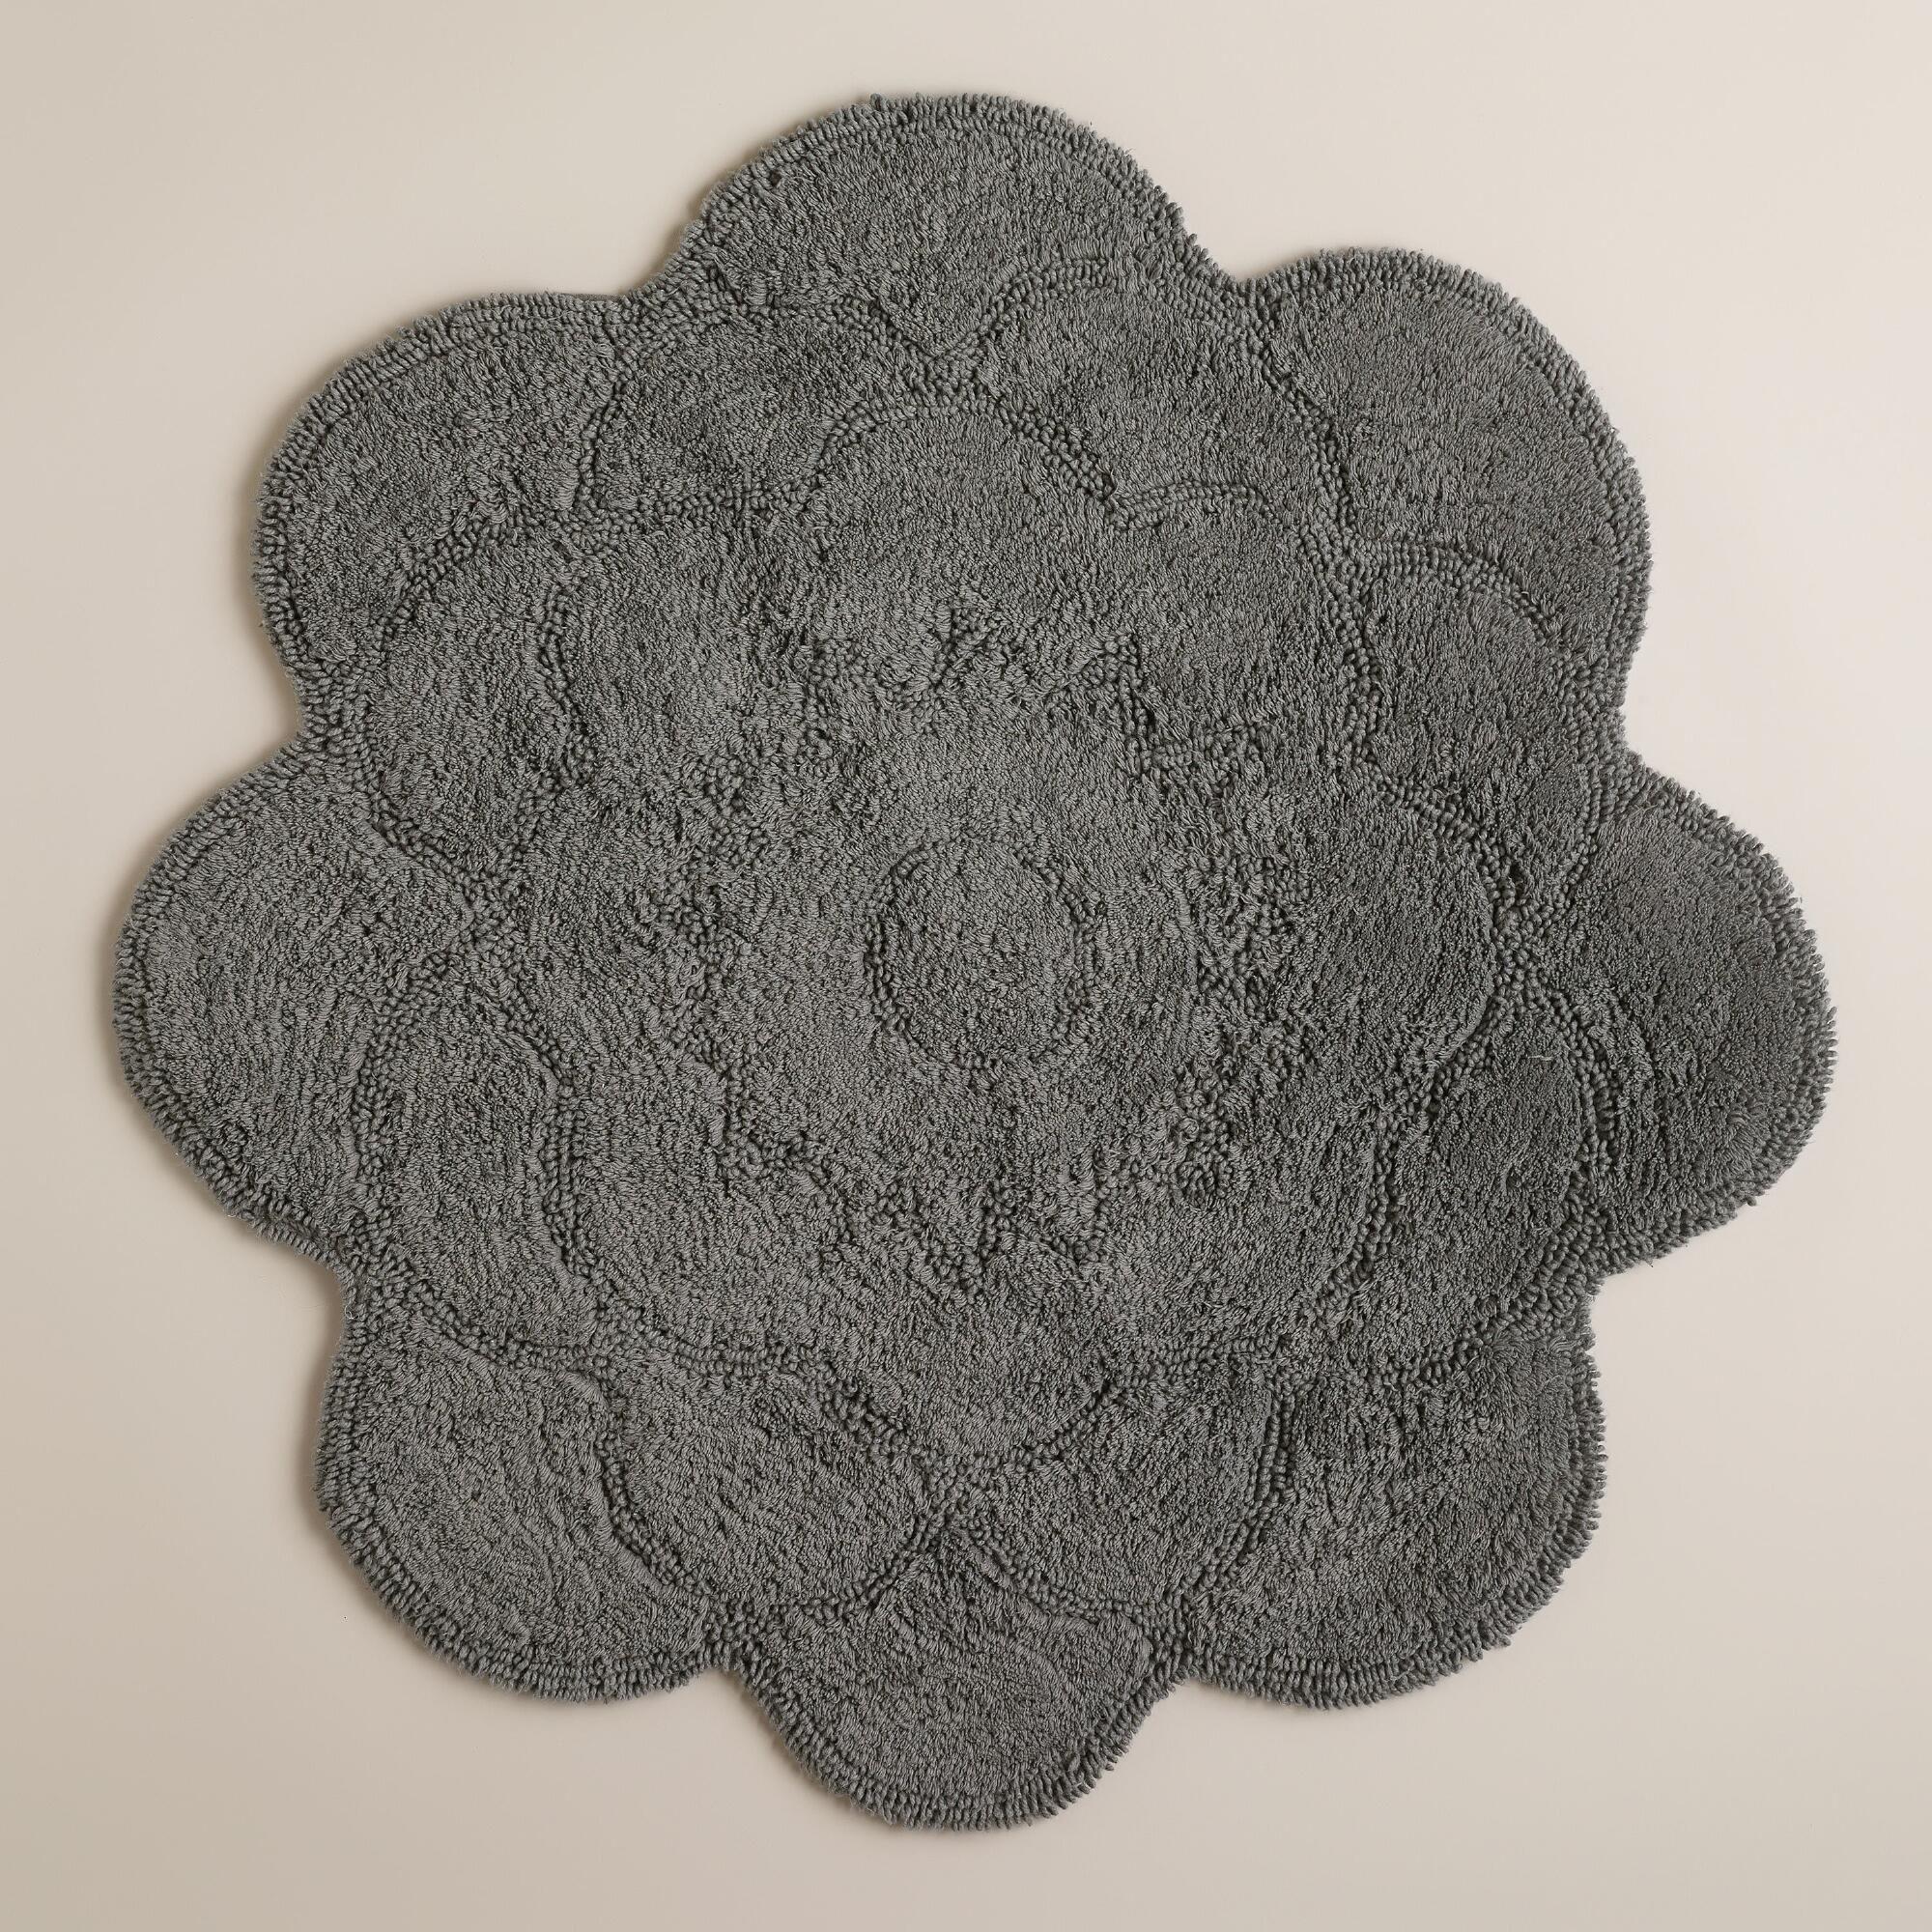 flower shaped rug gray